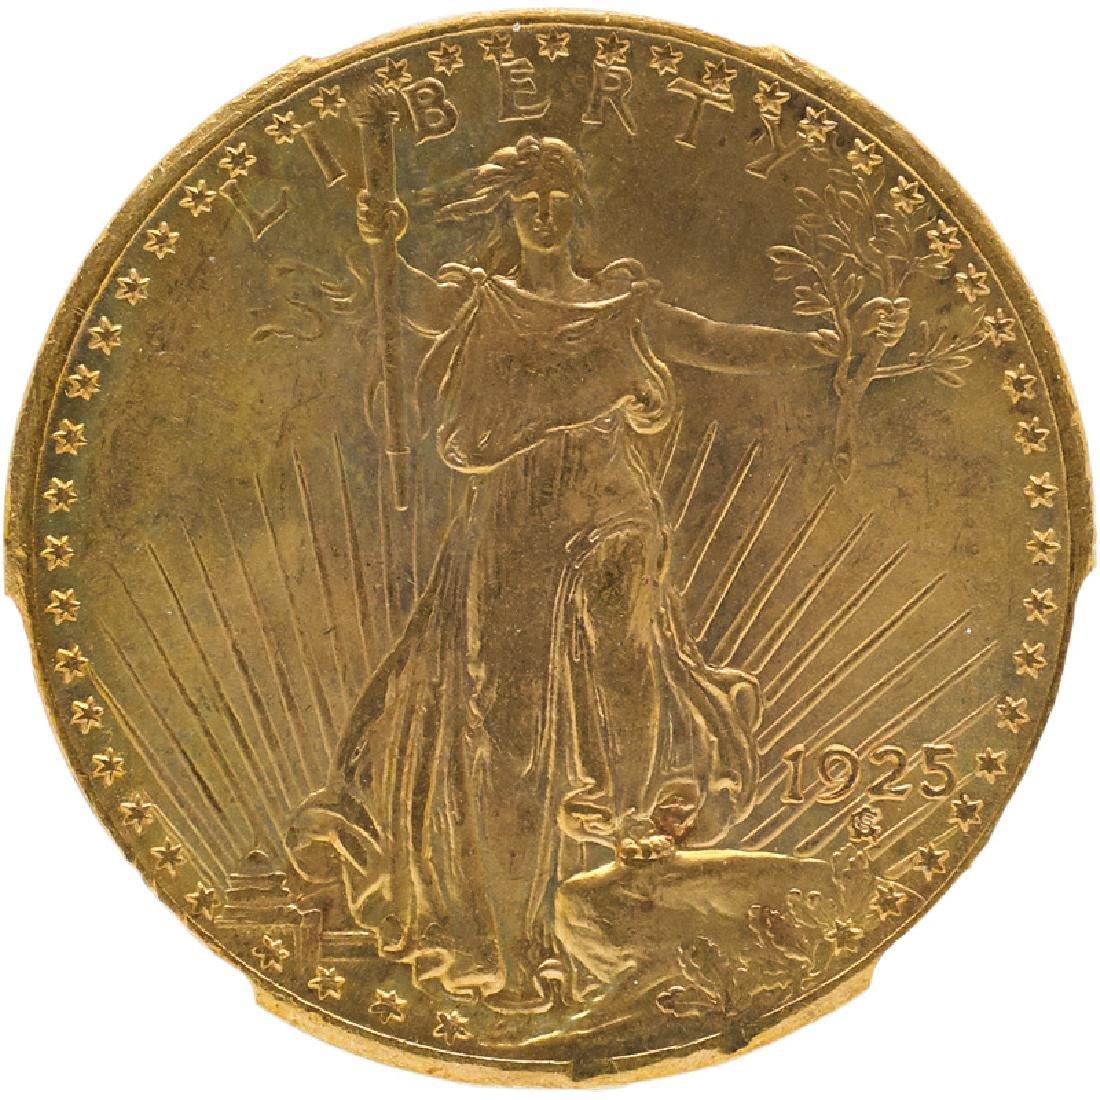 U.S. 1925 ST. GAUDENS $20 GOLD COIN